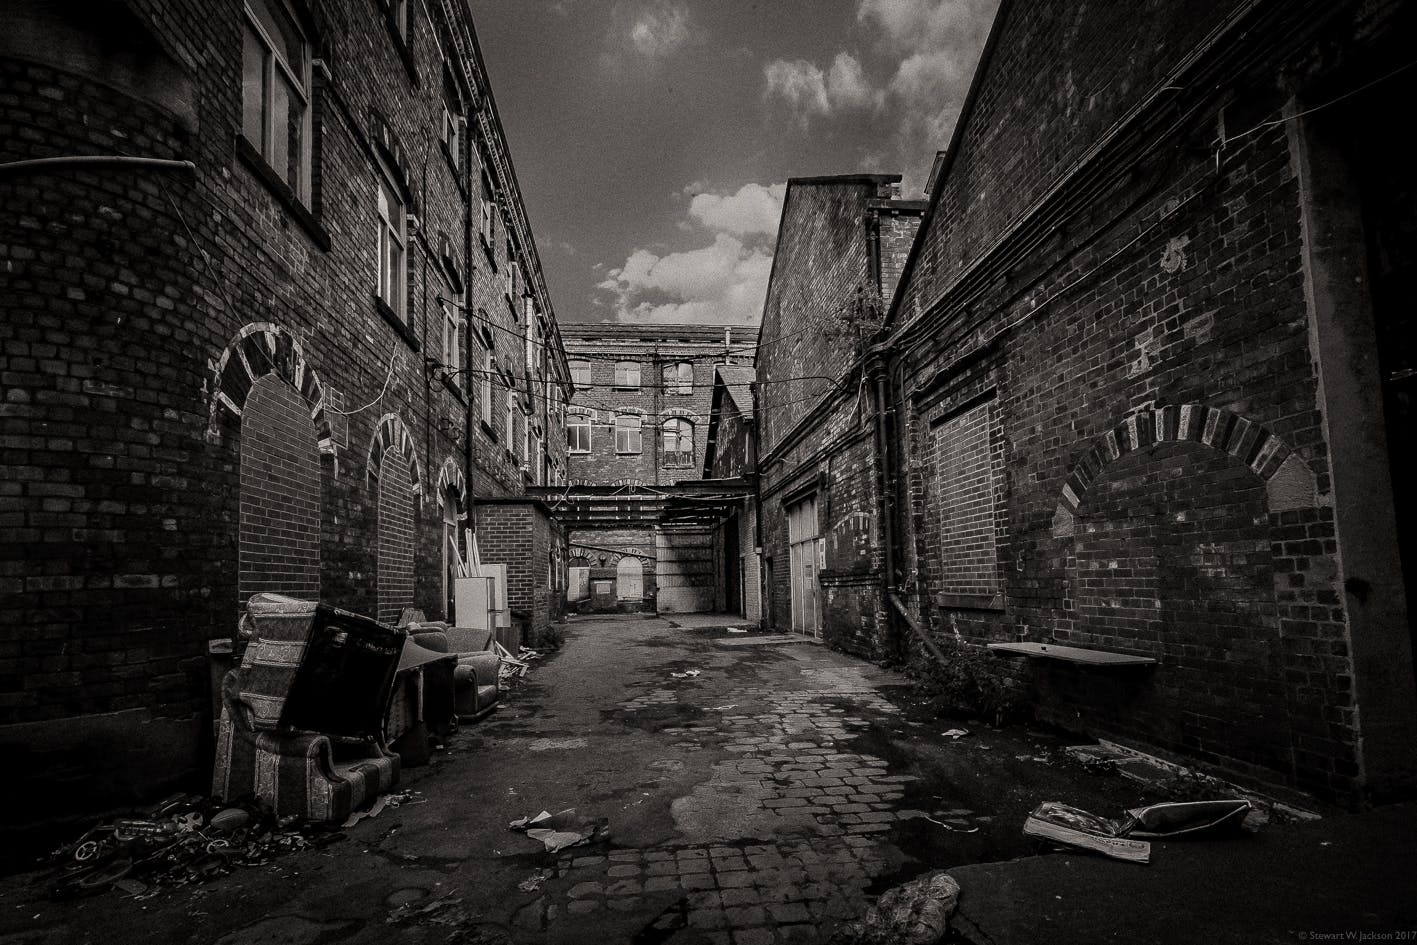 Rutland Mills © Stewart W Jackson